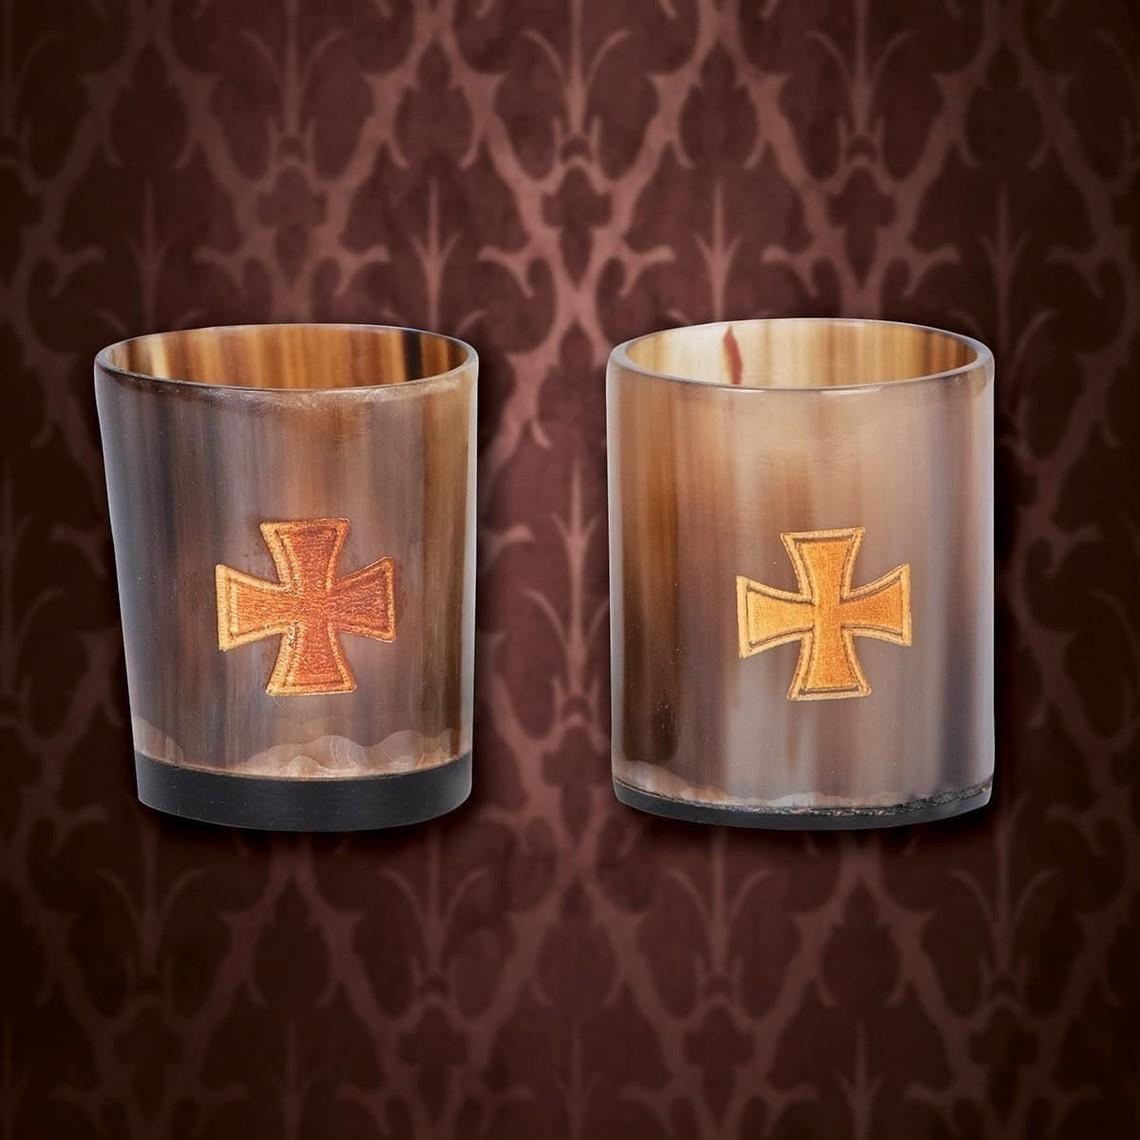 Windlass Steelcrafts Horn colpo di vetro, a Templar